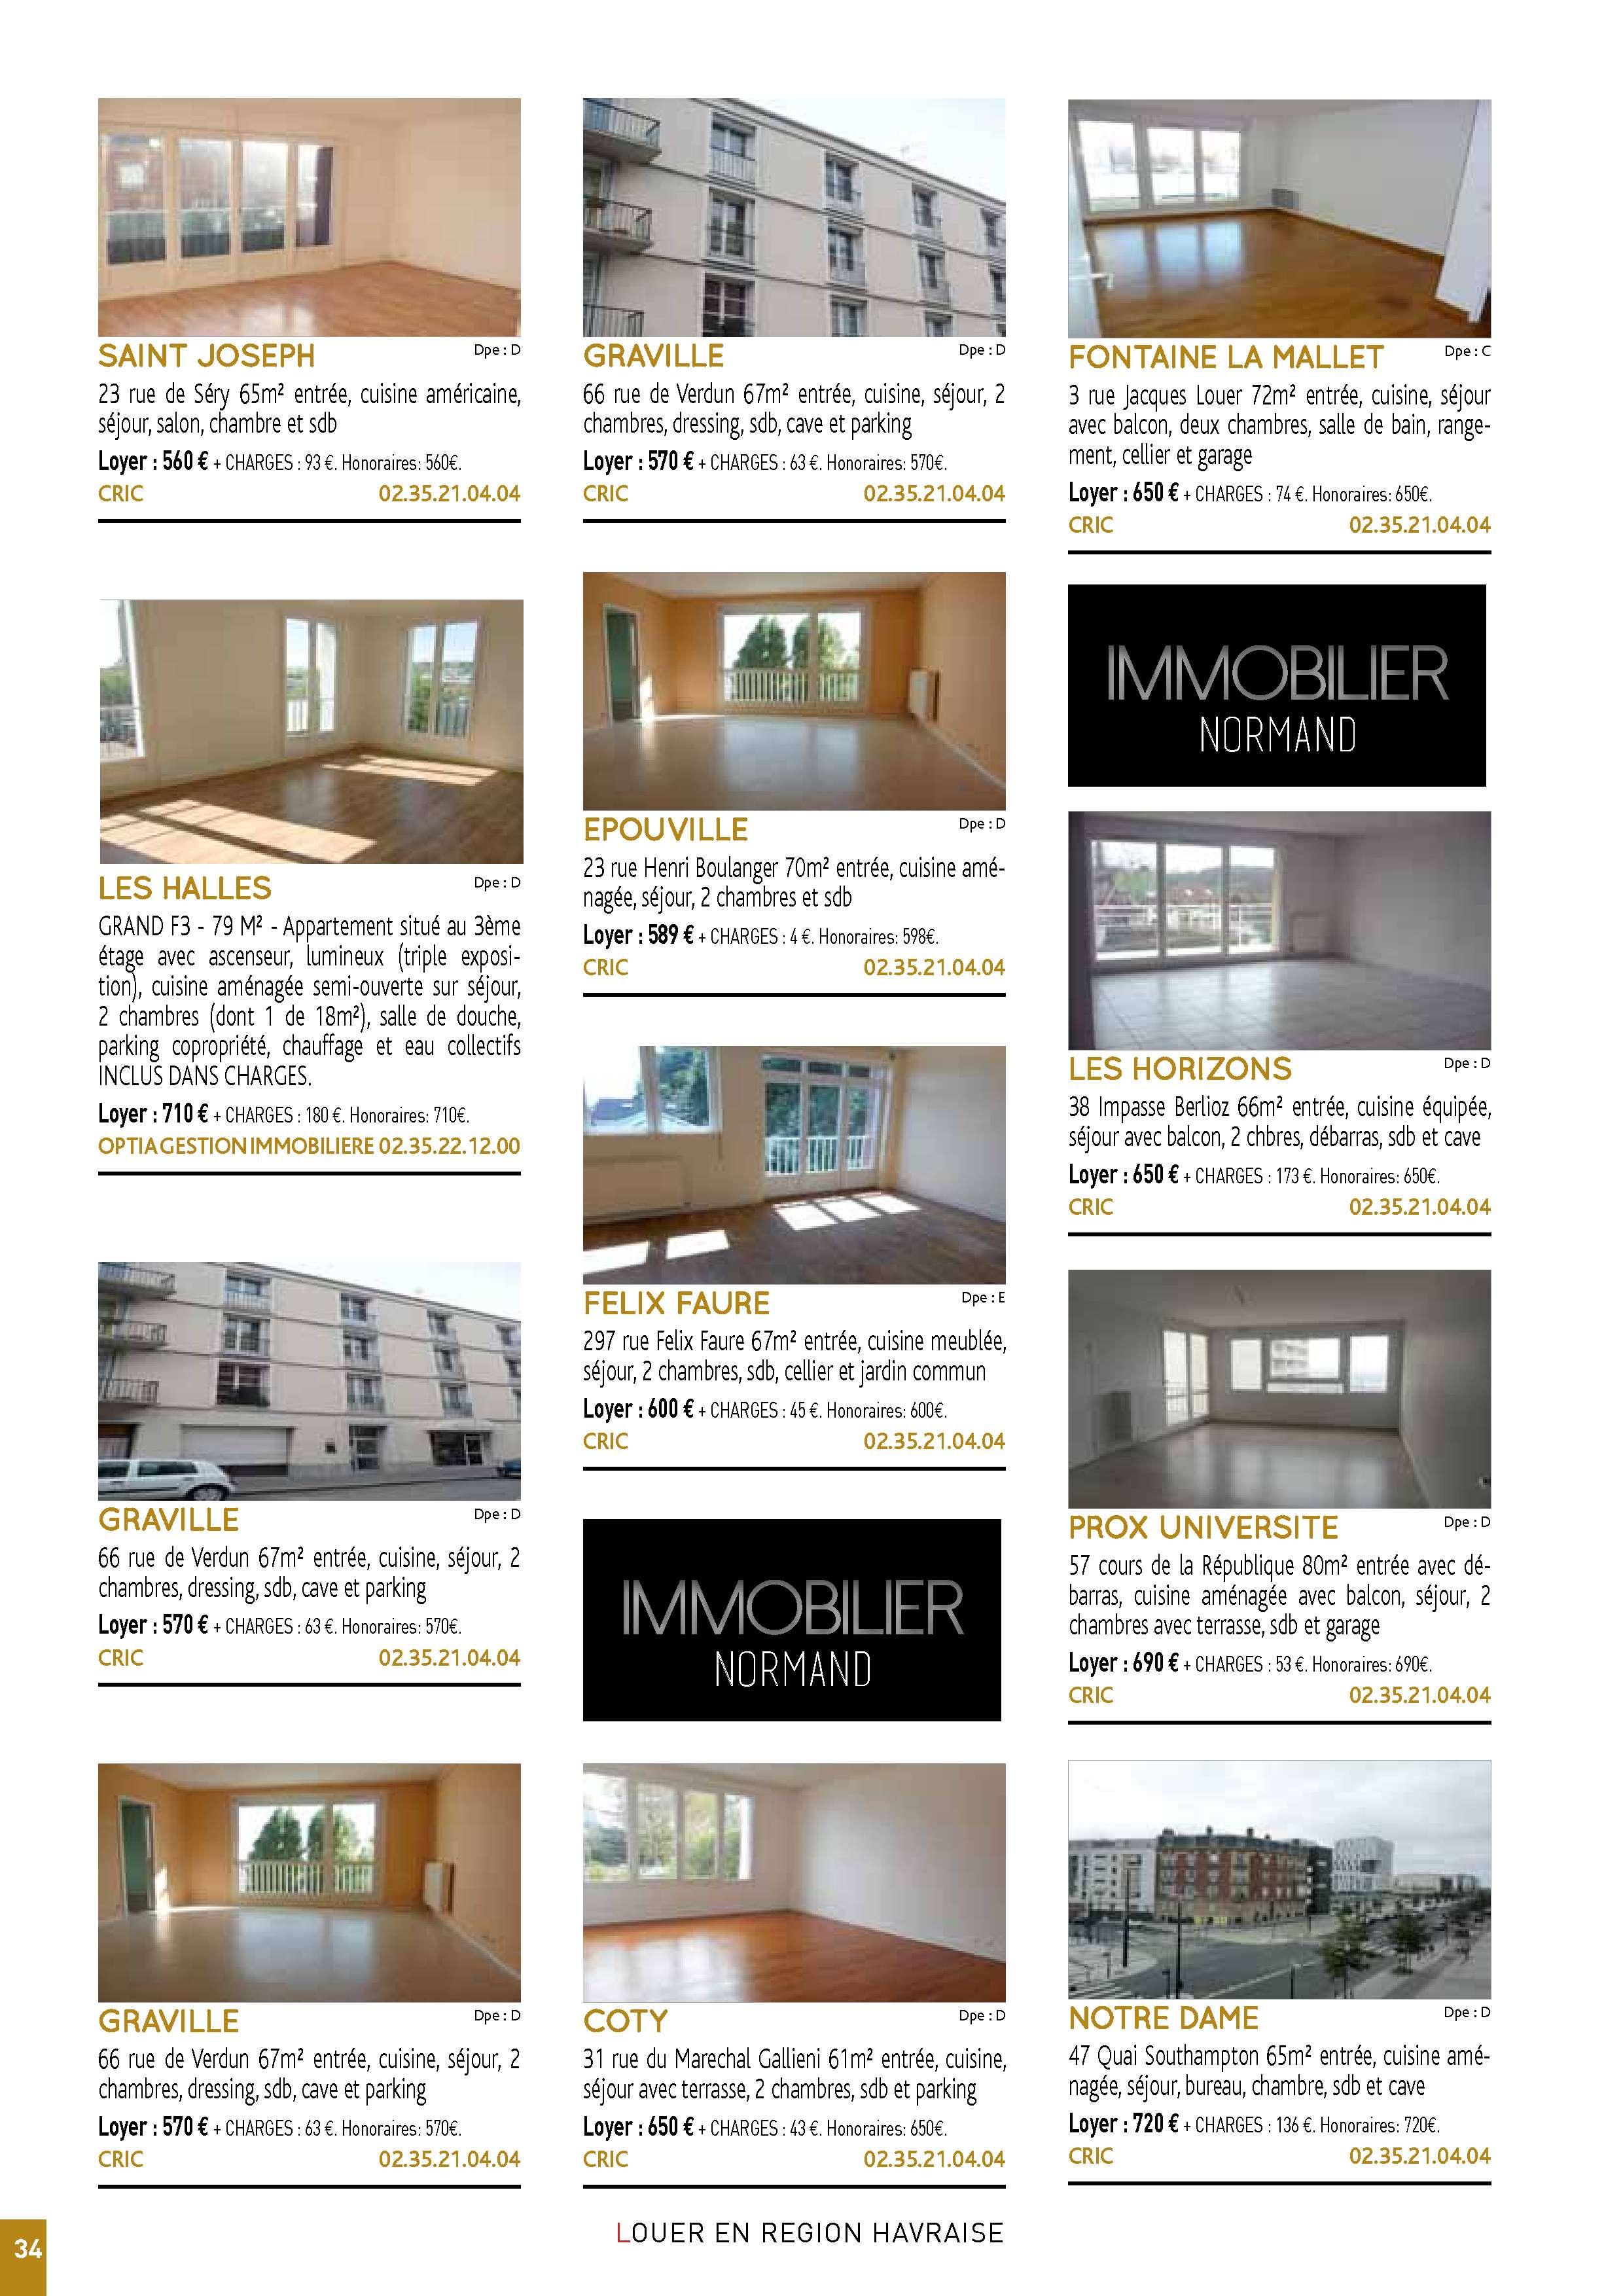 Chauffage Salle De Bain Boulanger ~ immobilier normand magazine immo